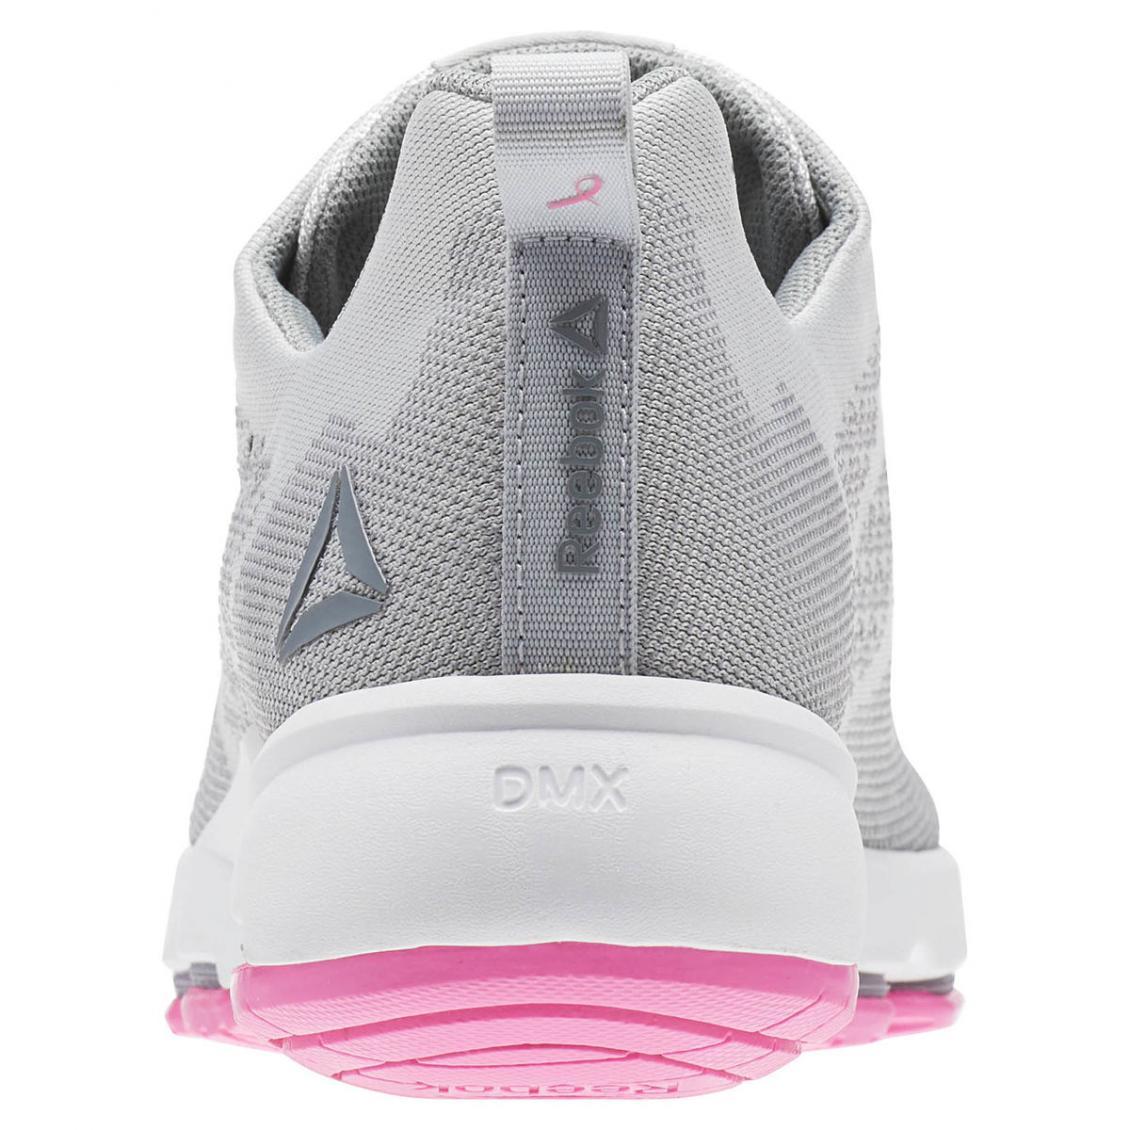 Grey – Reebok CloudRide LS DMX Womens Skull Grey / Flat Grey / White / Poison Pink